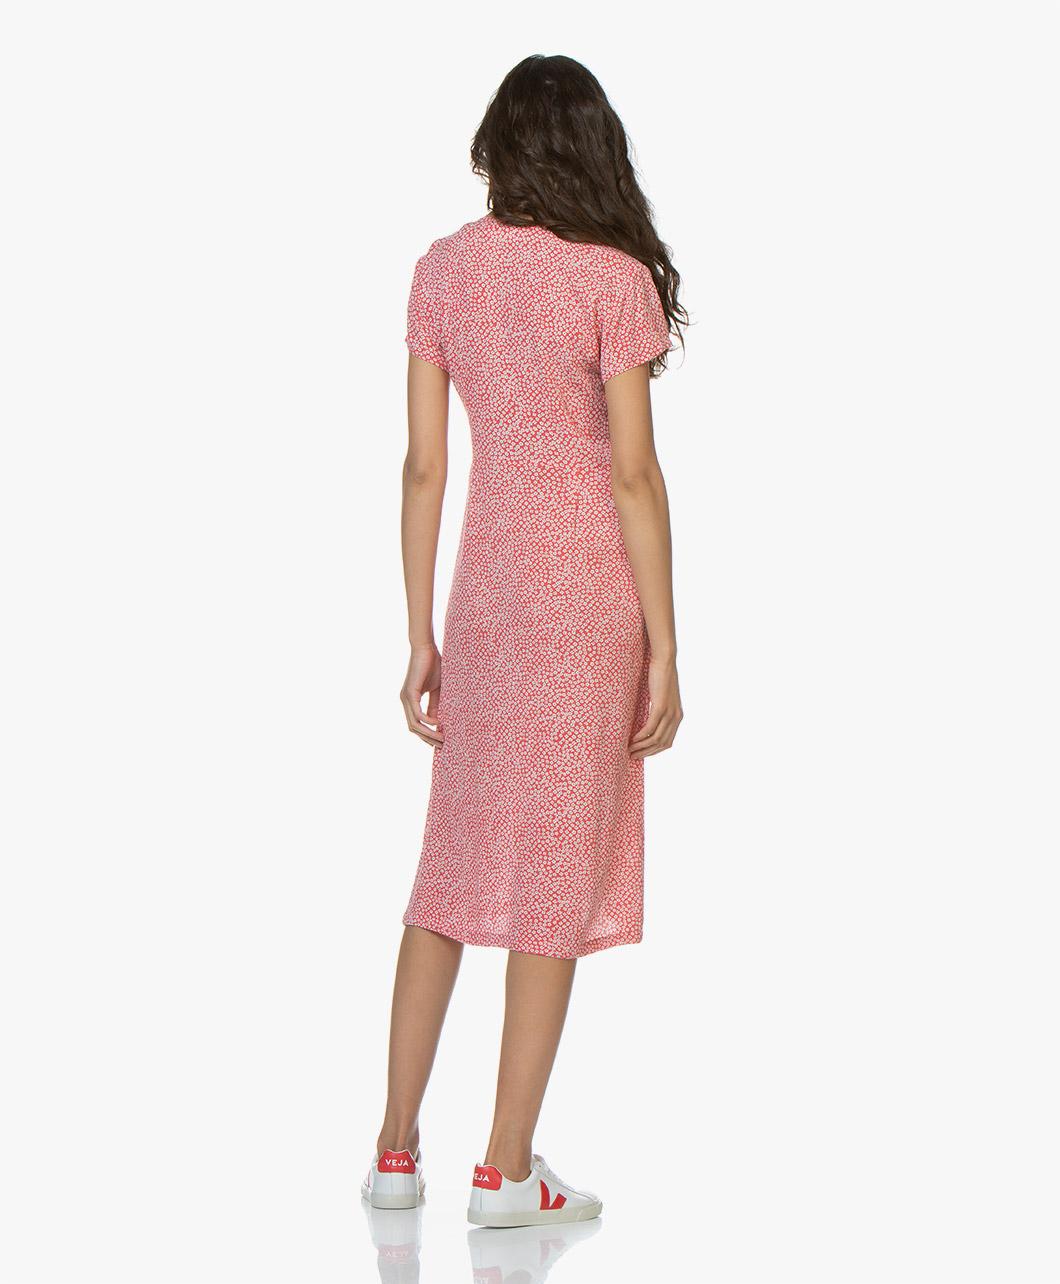 8e87c774339 indi   cold Floral Viscose Button-down Dress - Amapola - vv19mi520 217 -  amapola